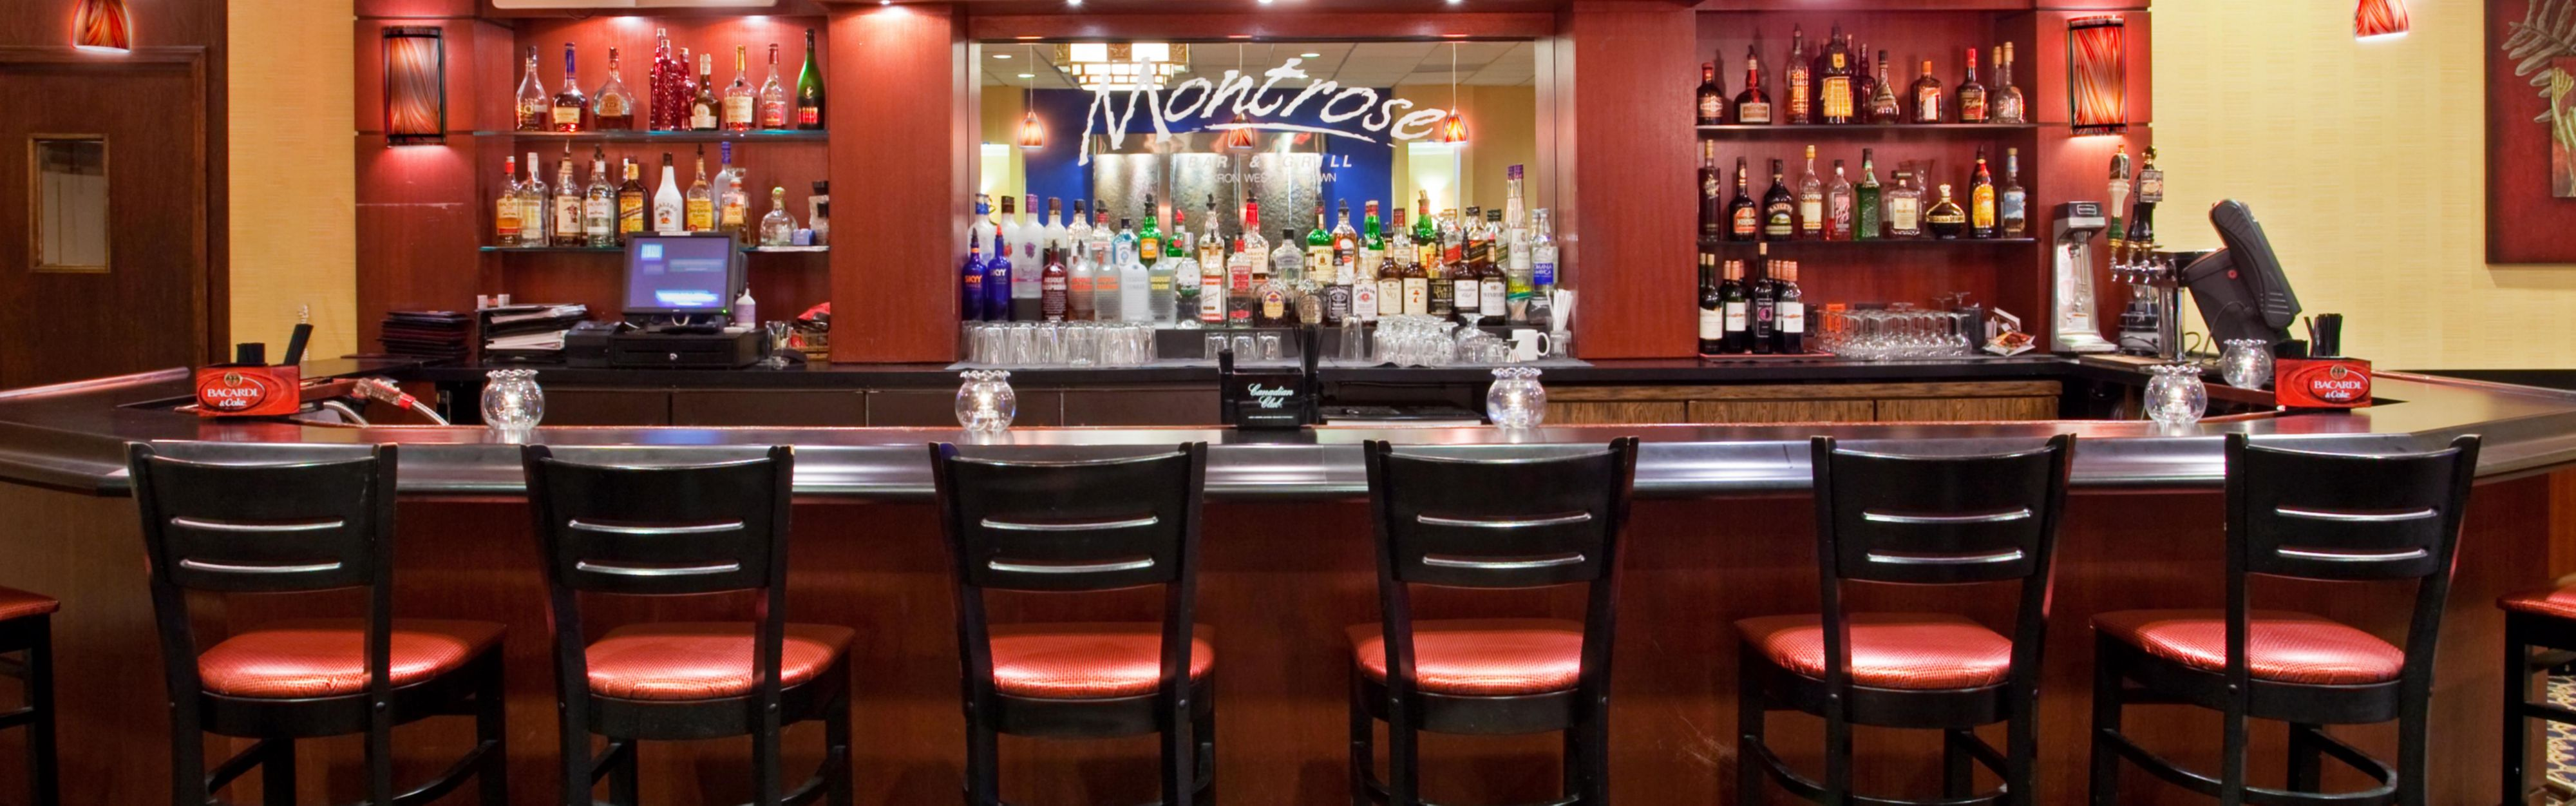 Holiday Inn Akron West - Fairlawn image 3